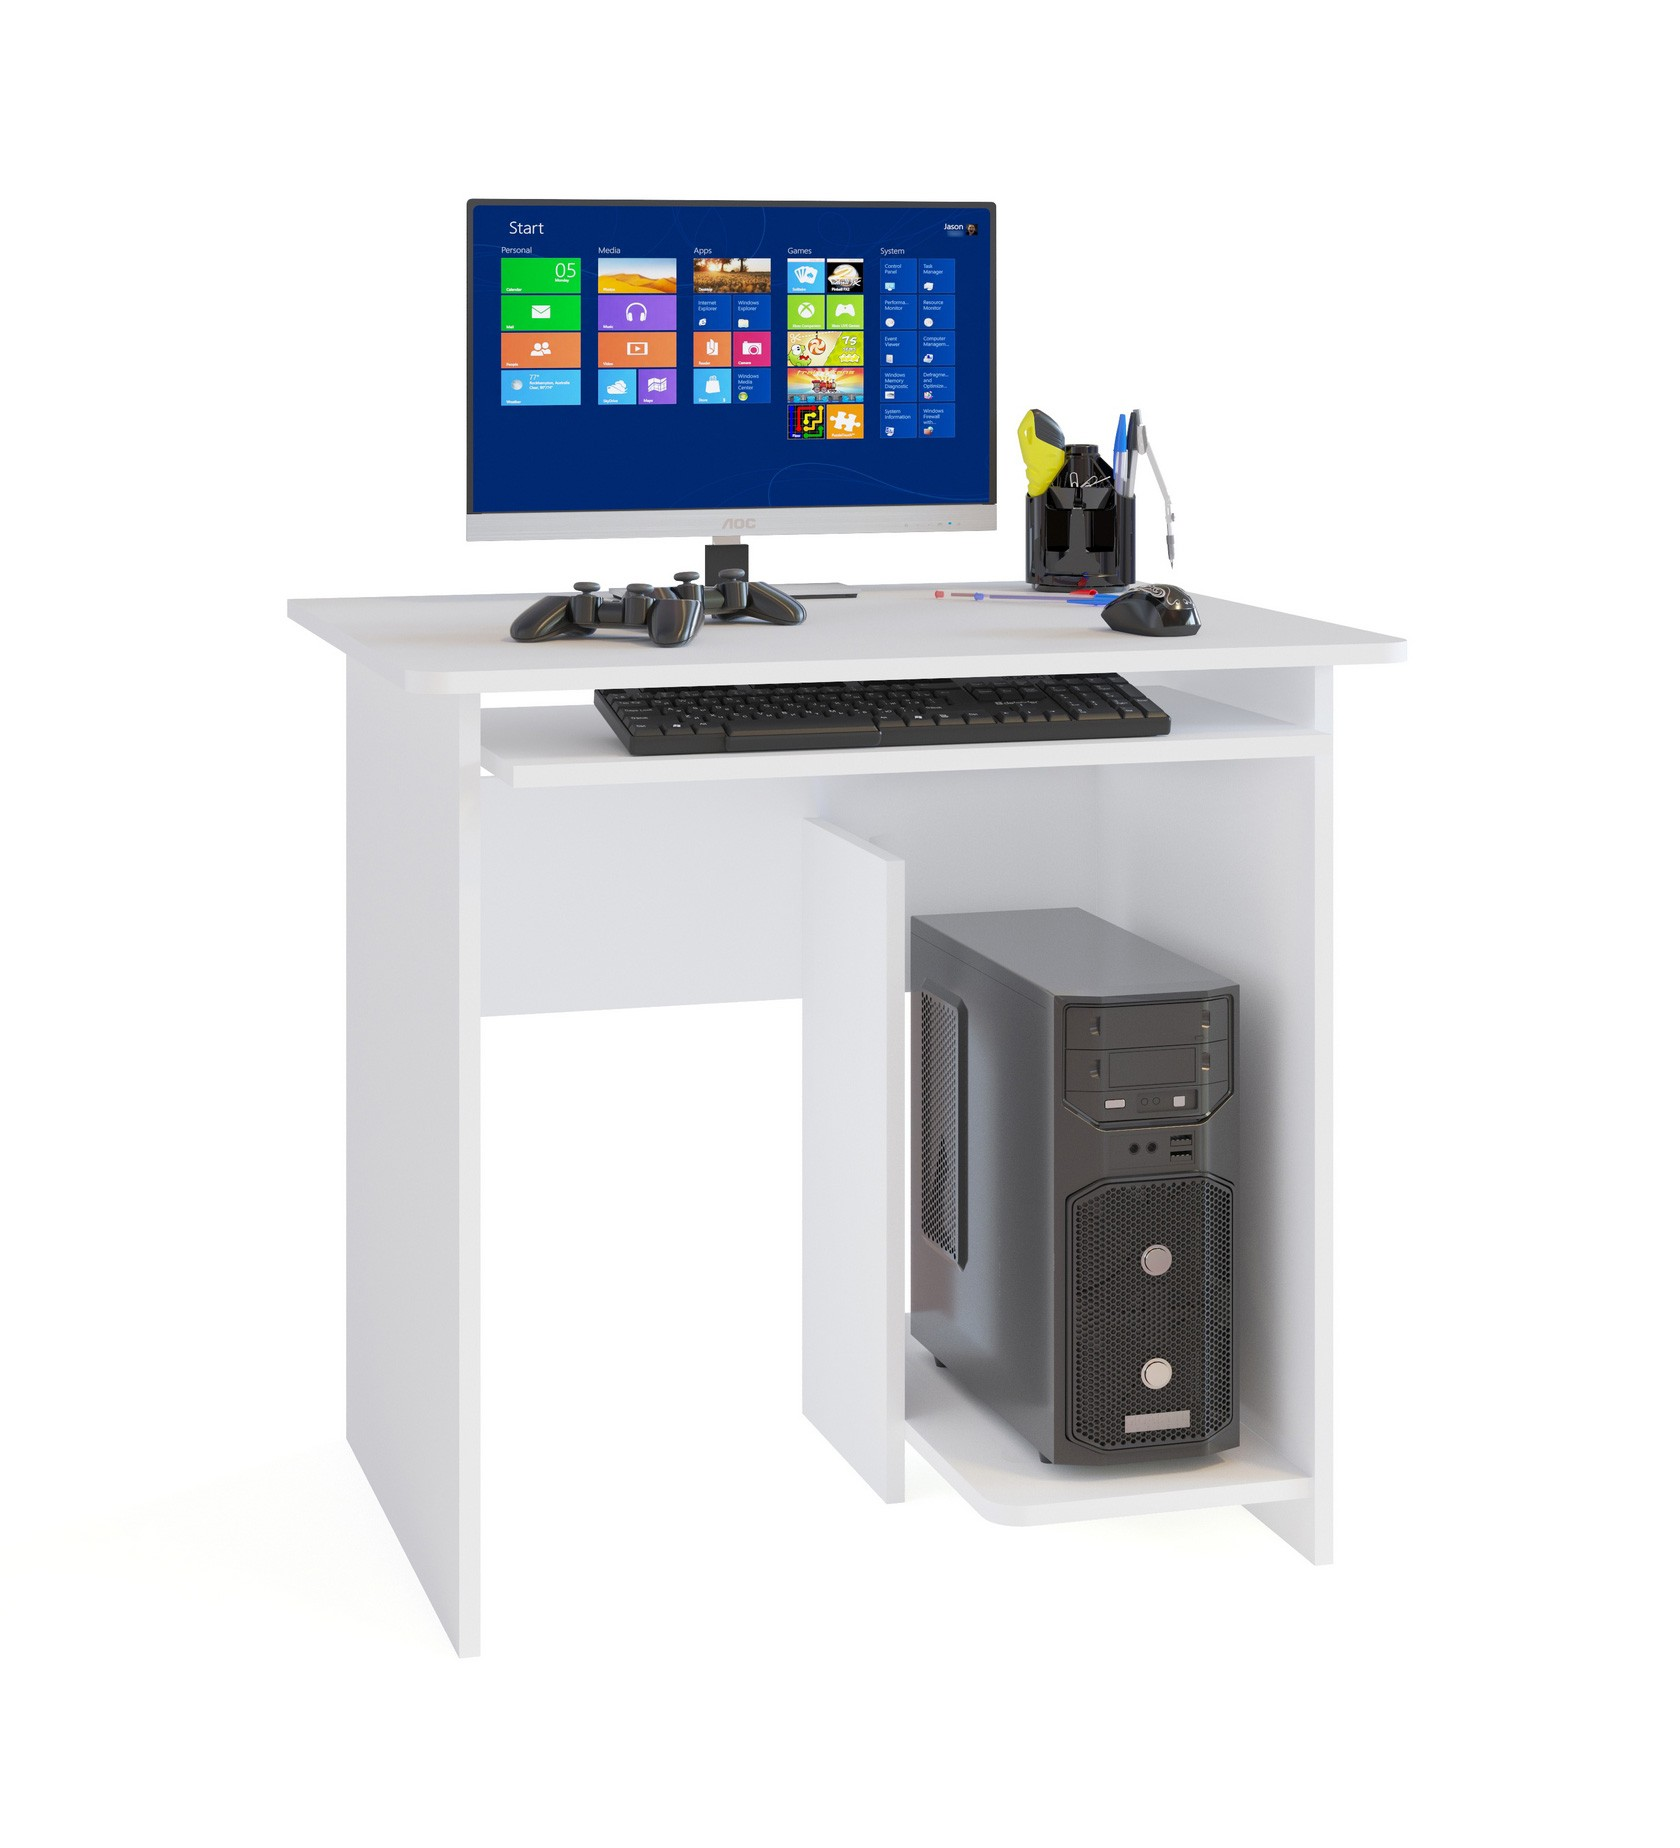 Стол компьютерный Сокол КСТ-21.1